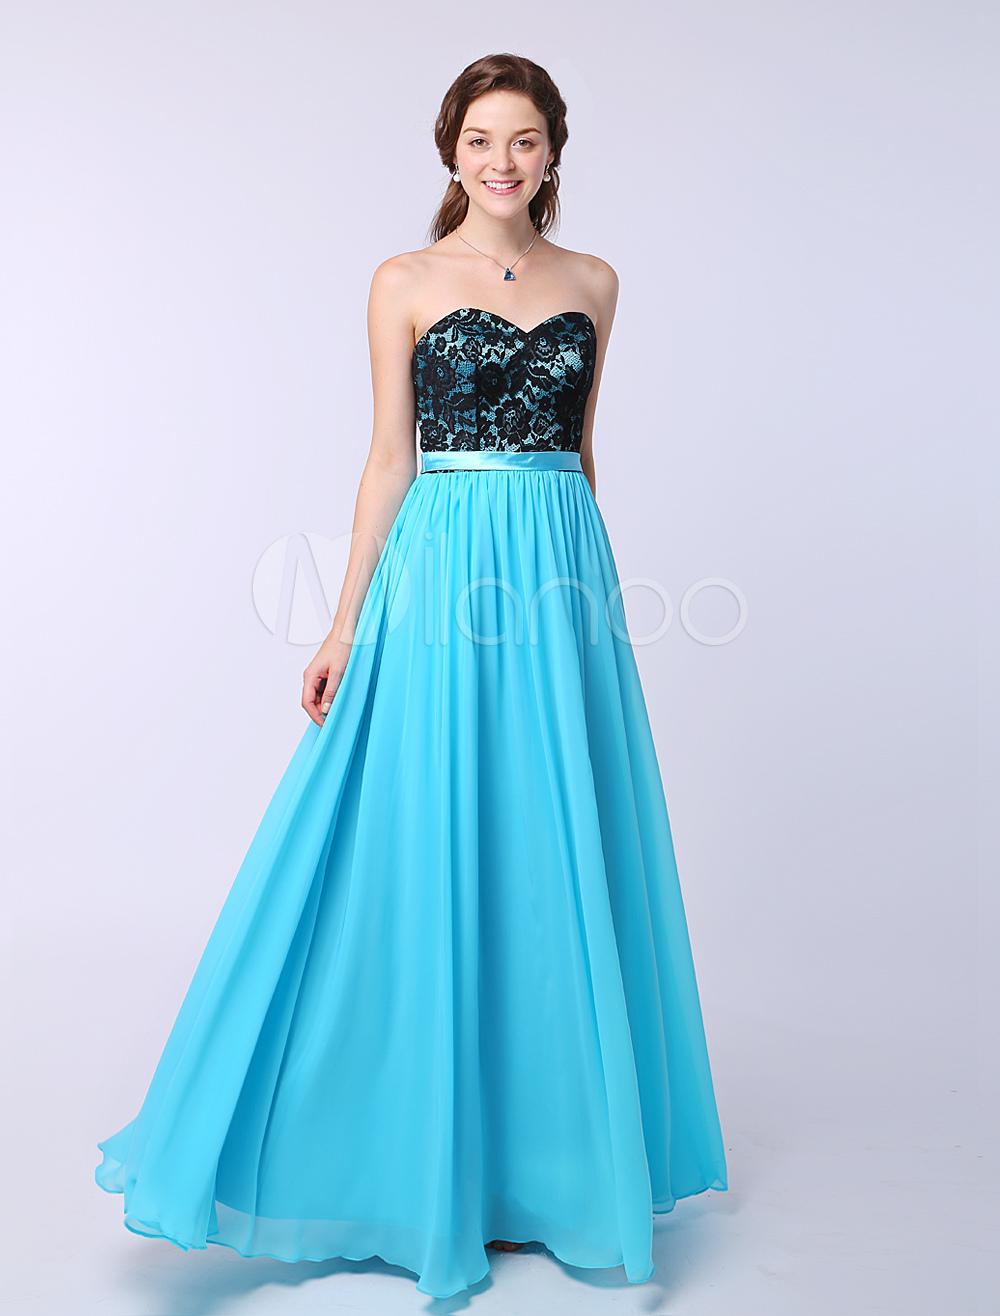 Aqua Sweetheart Bridesmaid Dress A Line Draped Floor Length Pleated Party Dress Milanoo